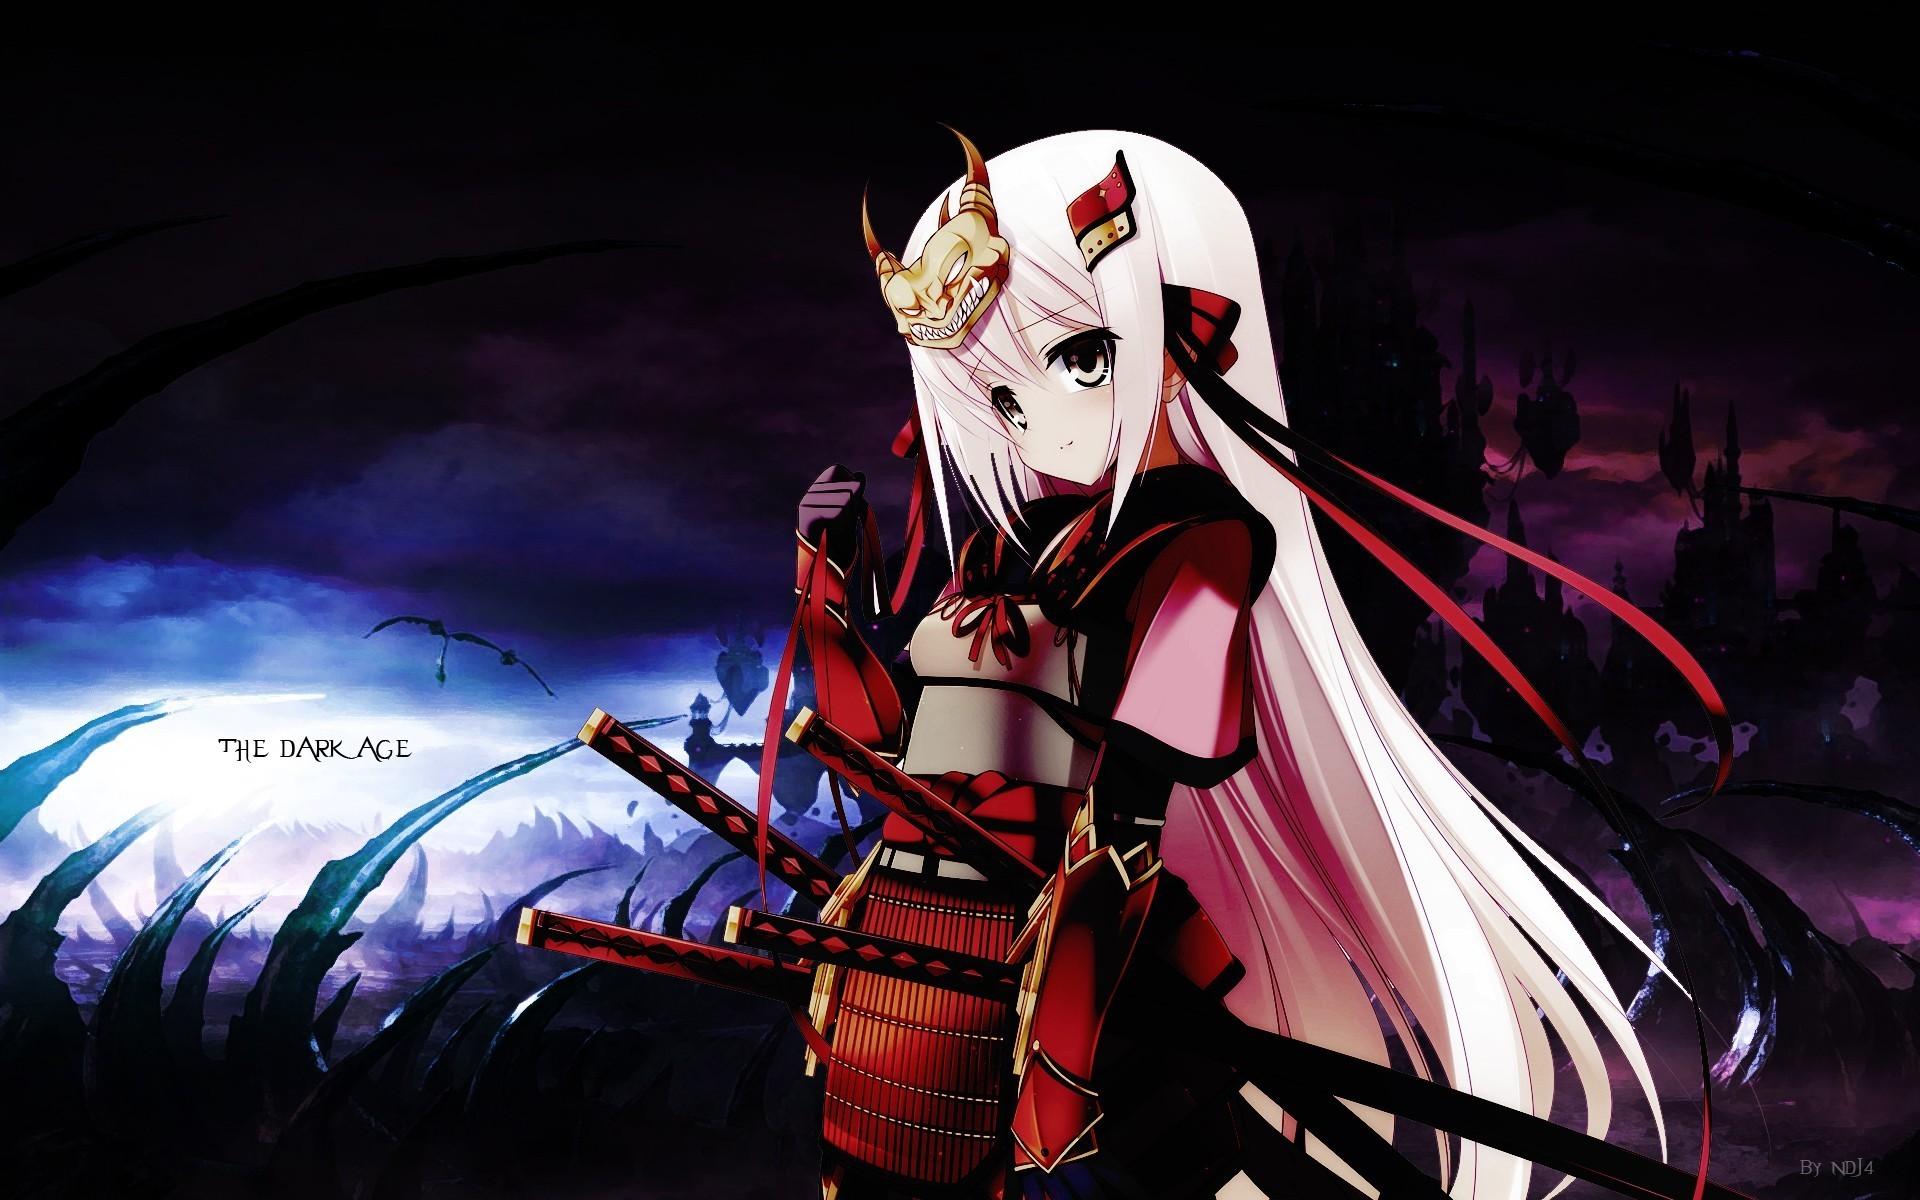 Dark katana samurai long hair ribbons weapons armor pink hair anime girls  swords hair ornaments wallpaper     10569   WallpaperUP